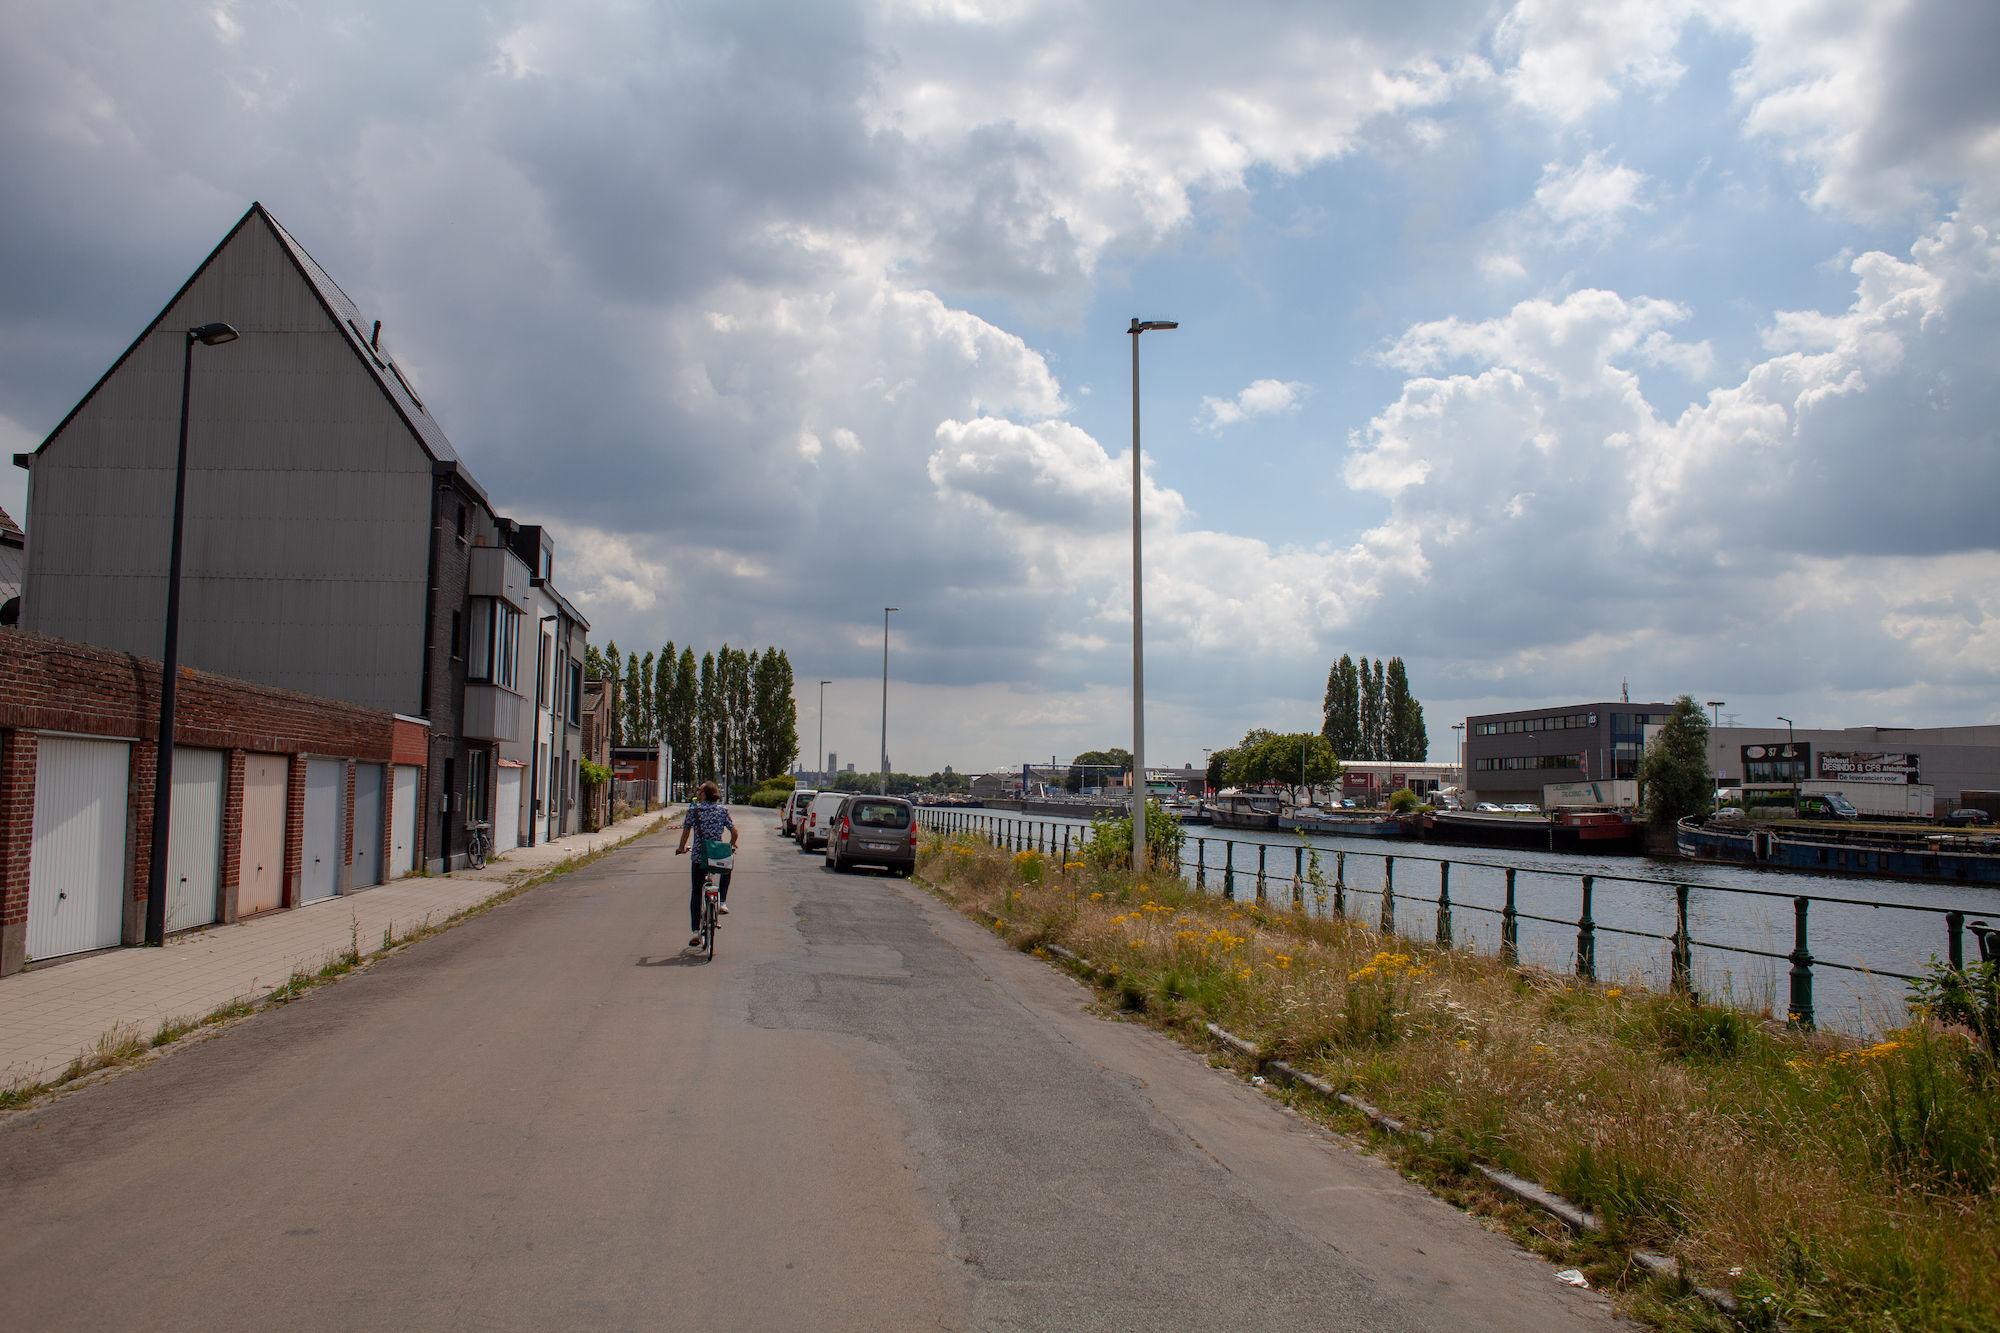 2019-07-02 Muide Meulestede prospectie Wannes_stadsvernieuwing_IMG_0381-2.jpg